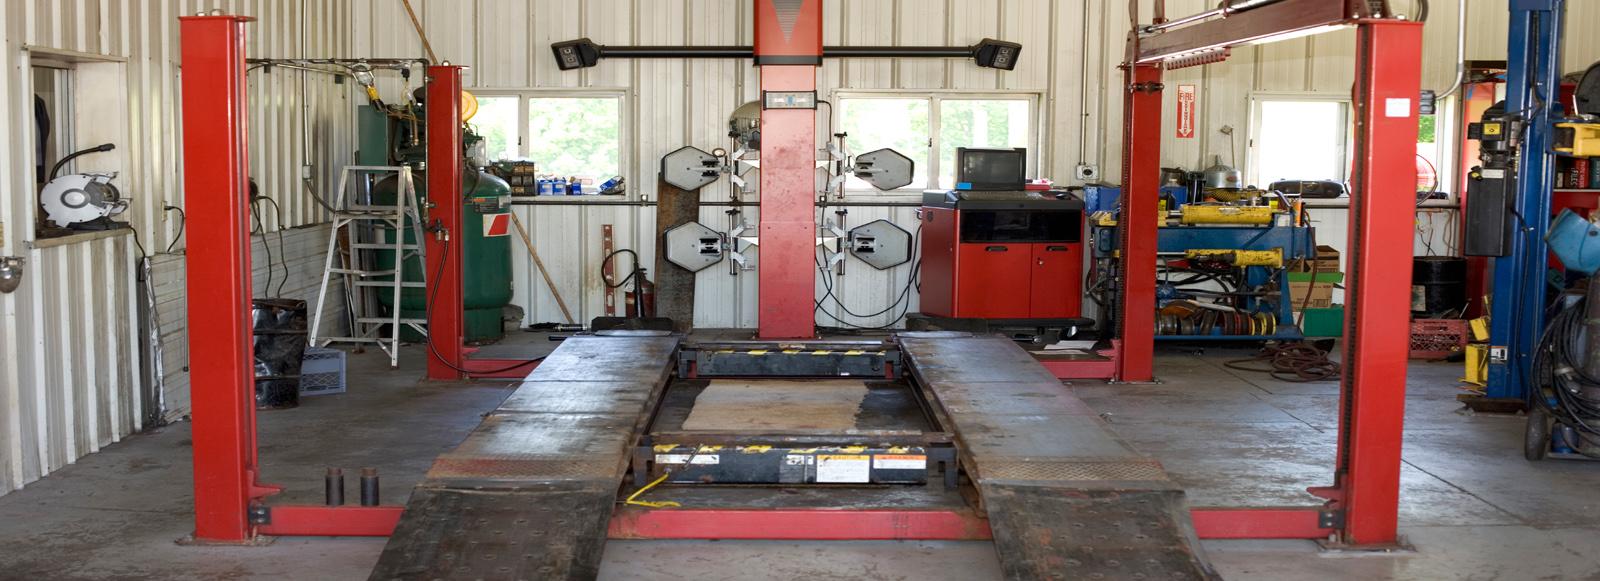 Bill's Alignment & Auto Service Inc - expert auto repair ...